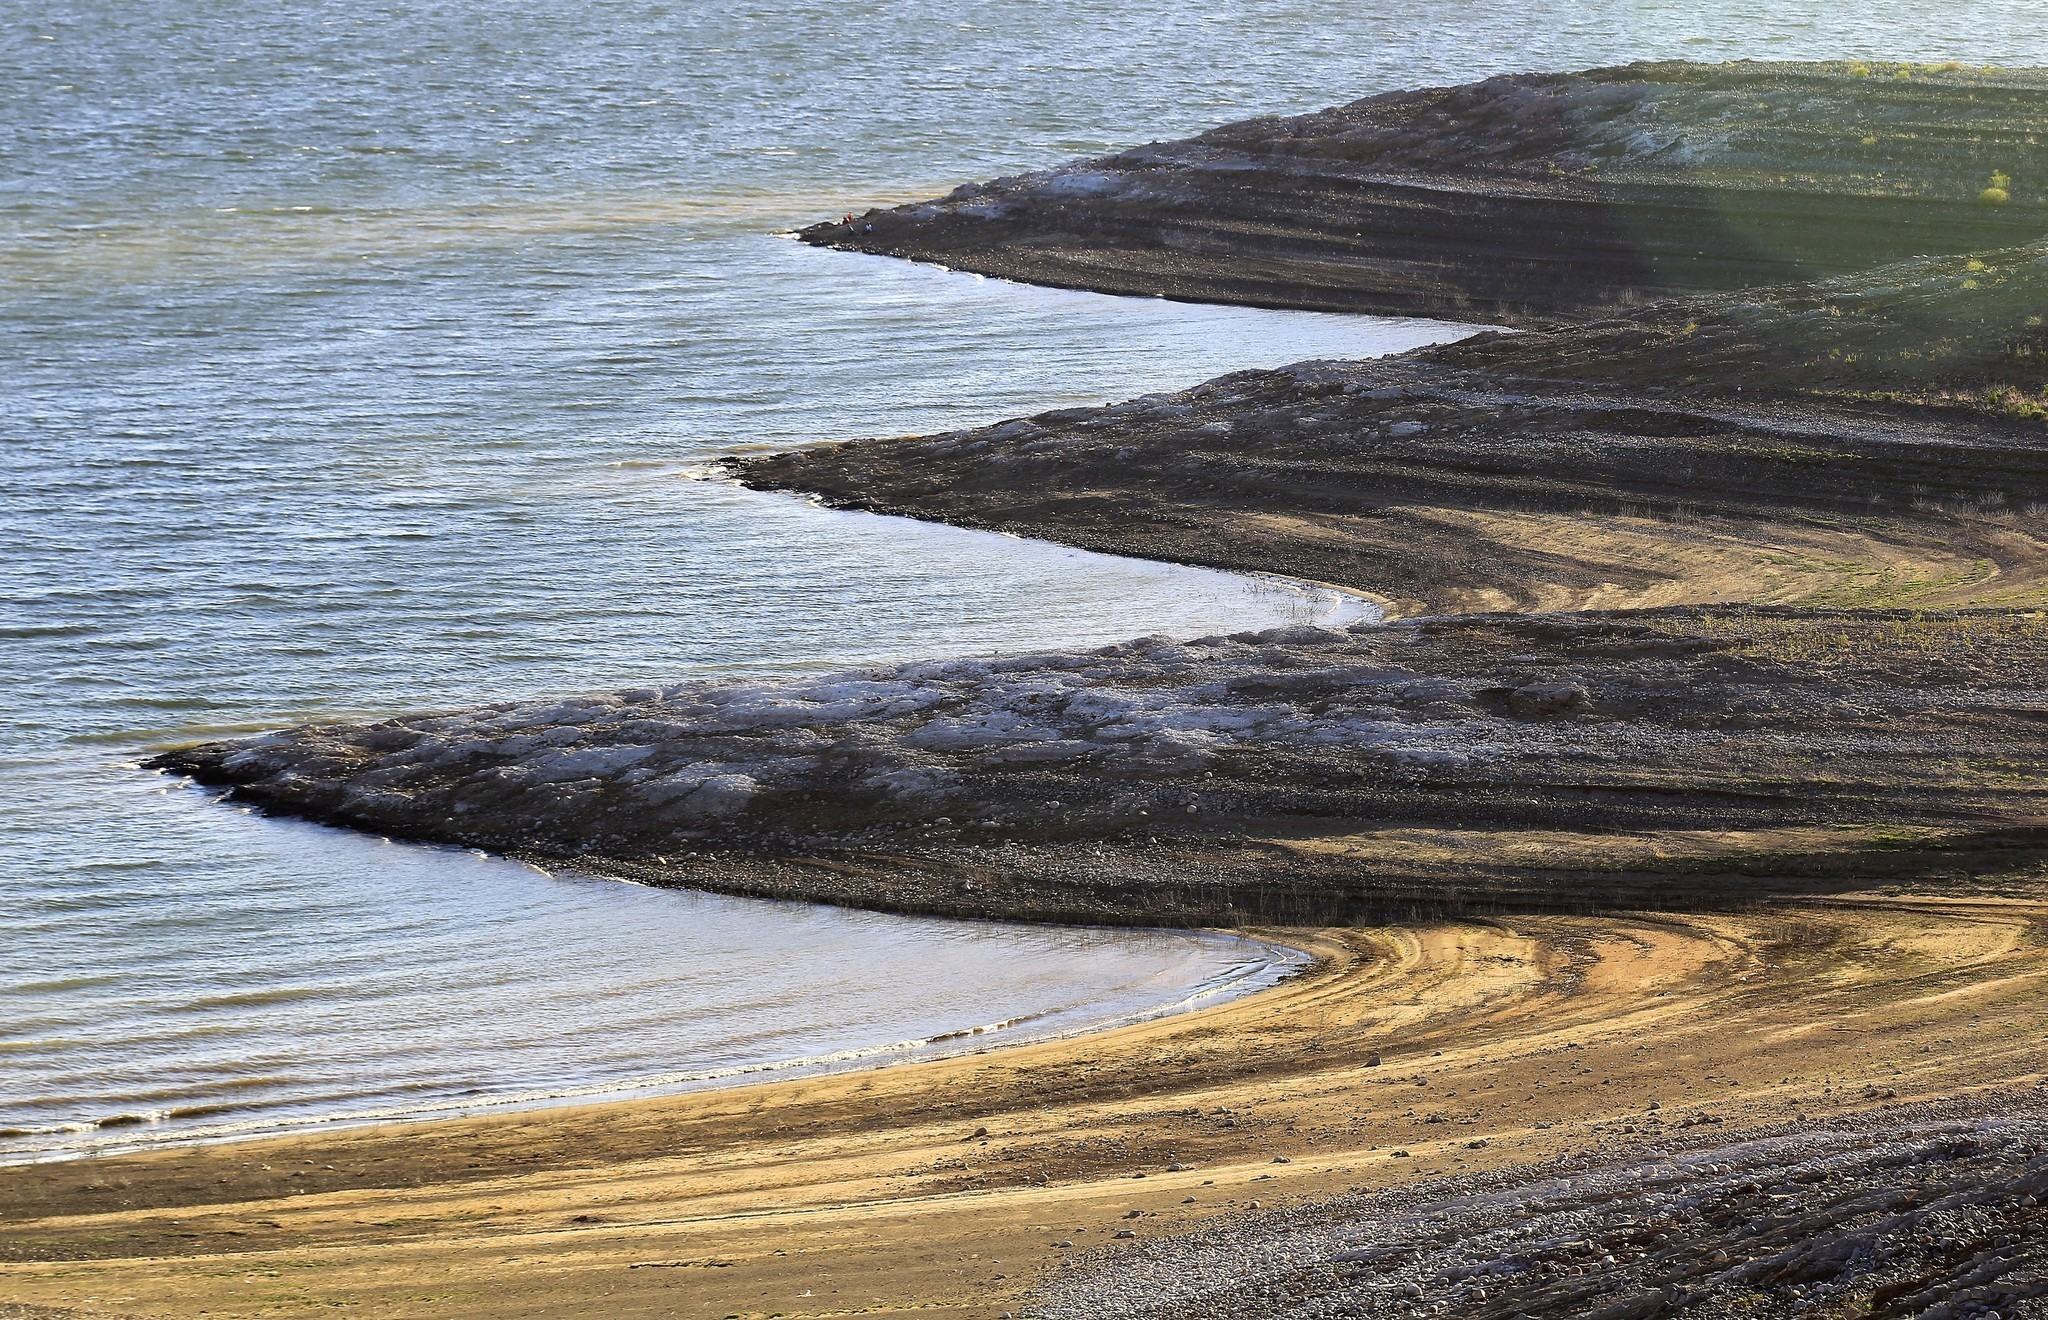 Amid California's drought, a bruising battle for cheap water